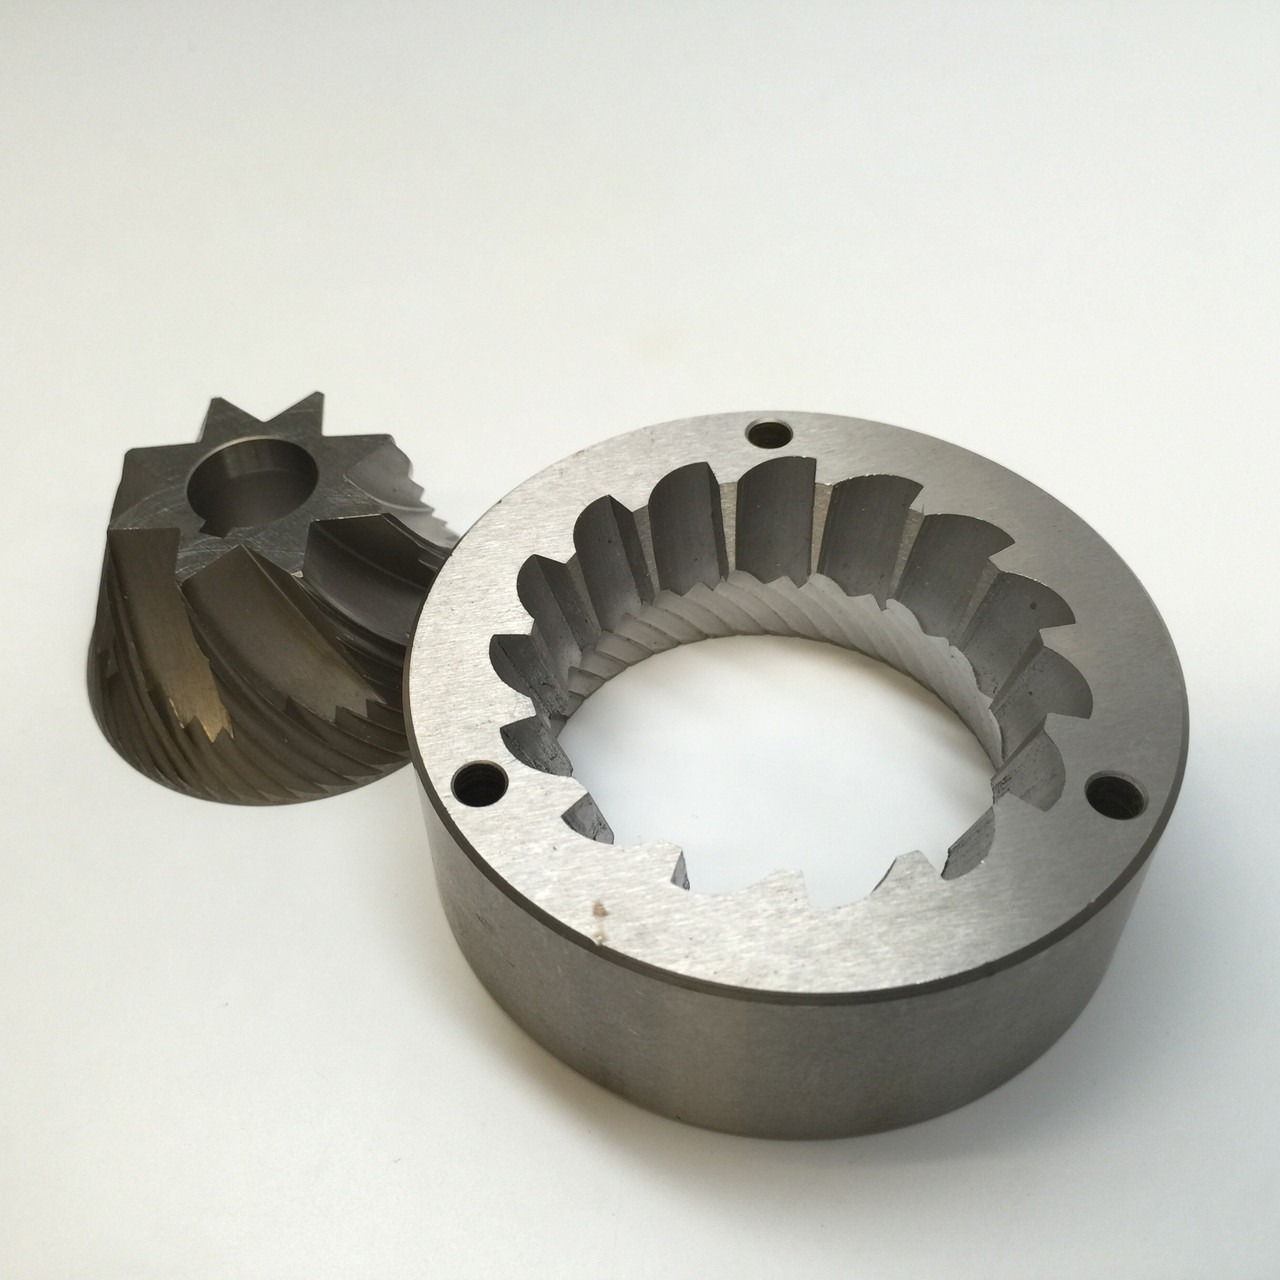 Revolution Grindmore 71 mm Conical Burr Set - fits Mazzer Robur -